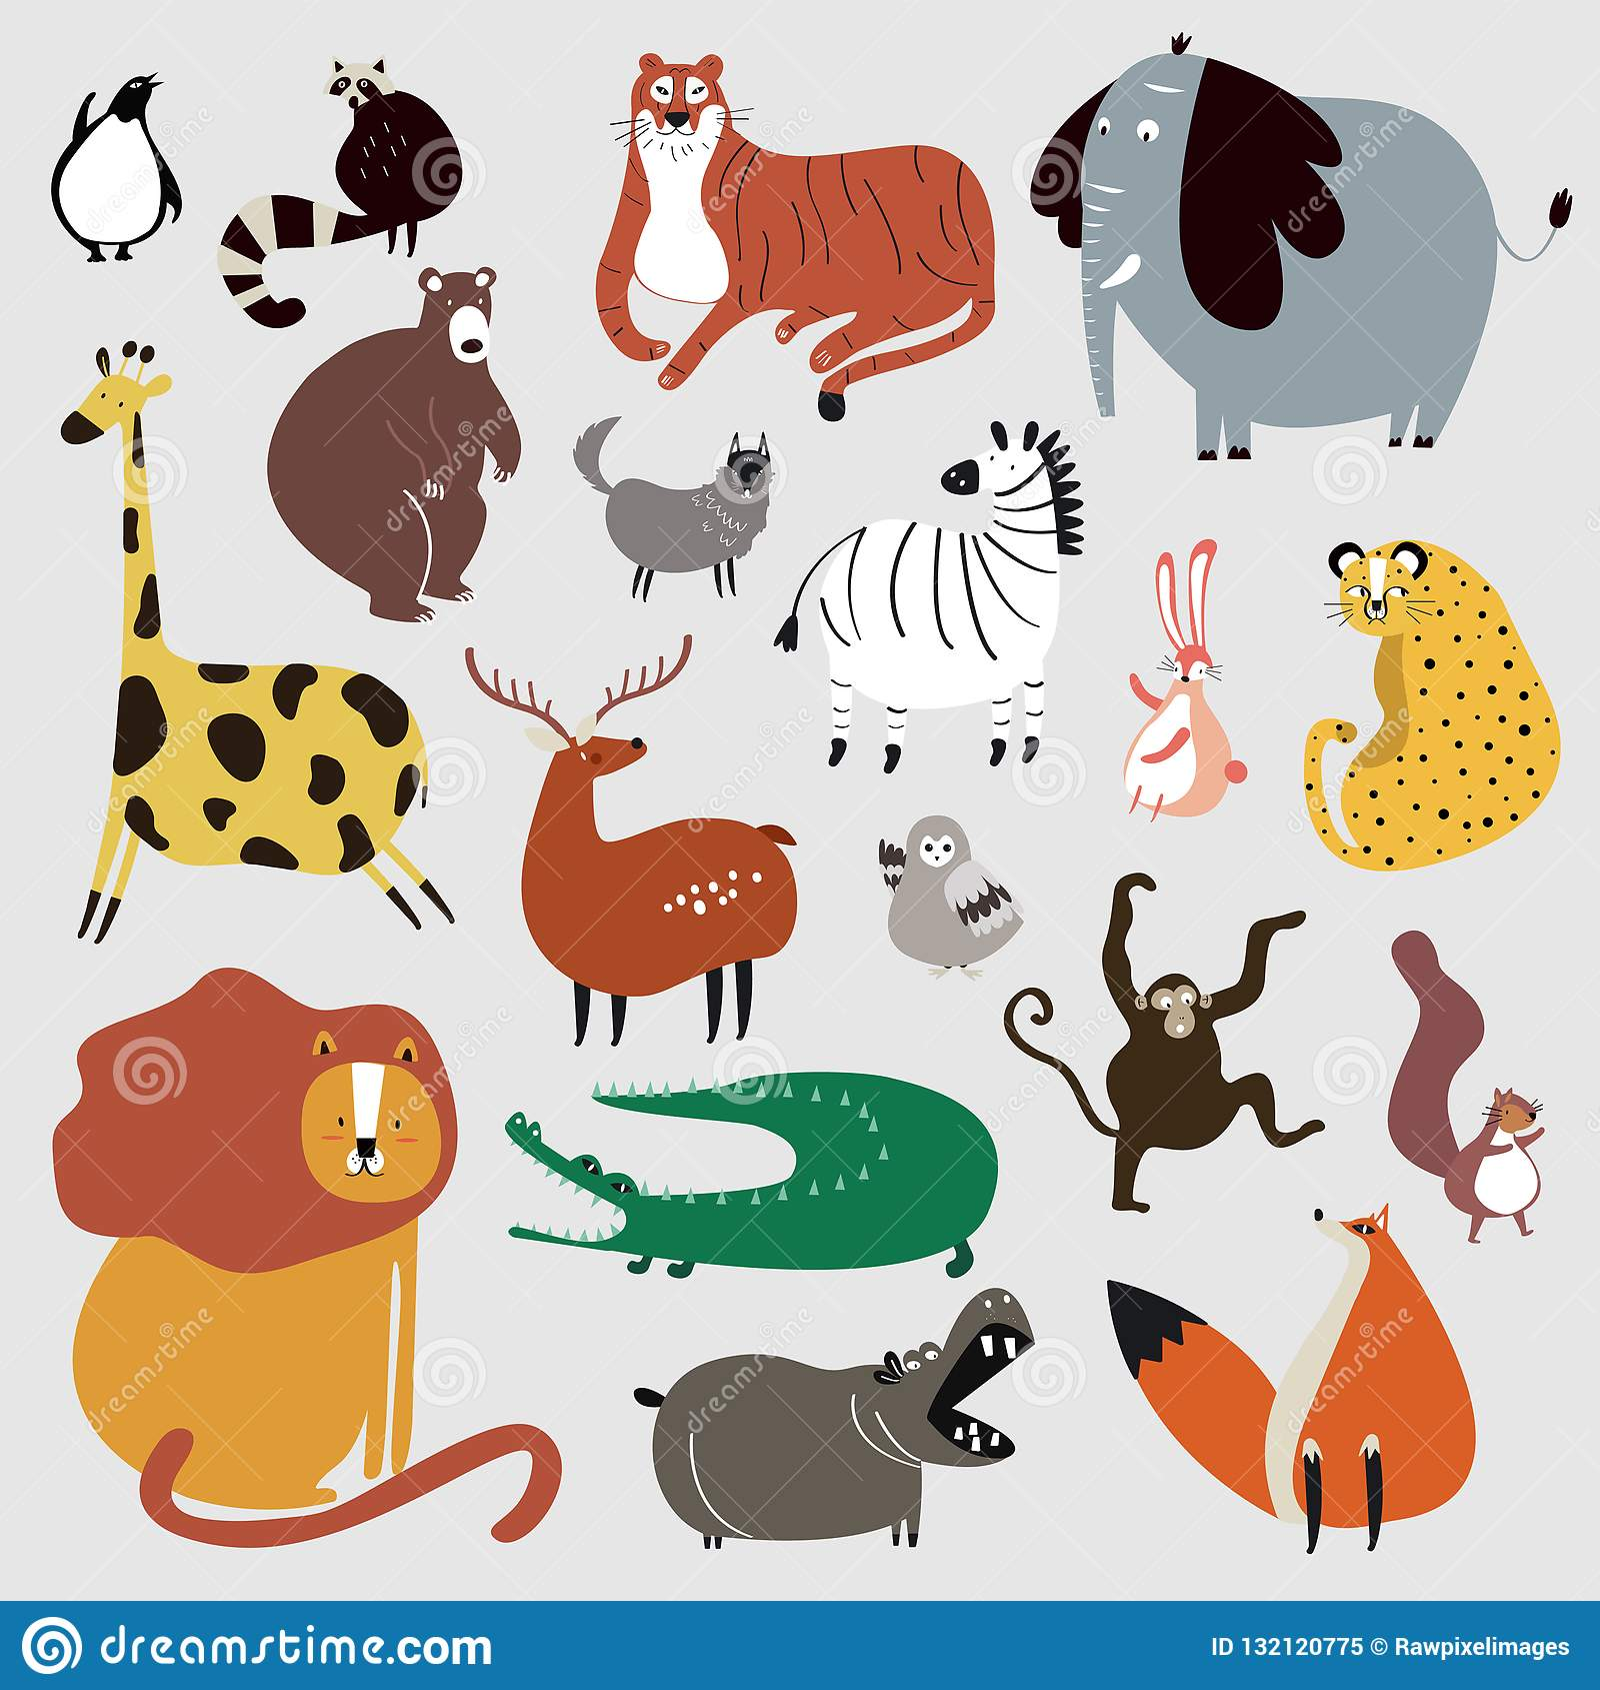 Картинки в кореле животные